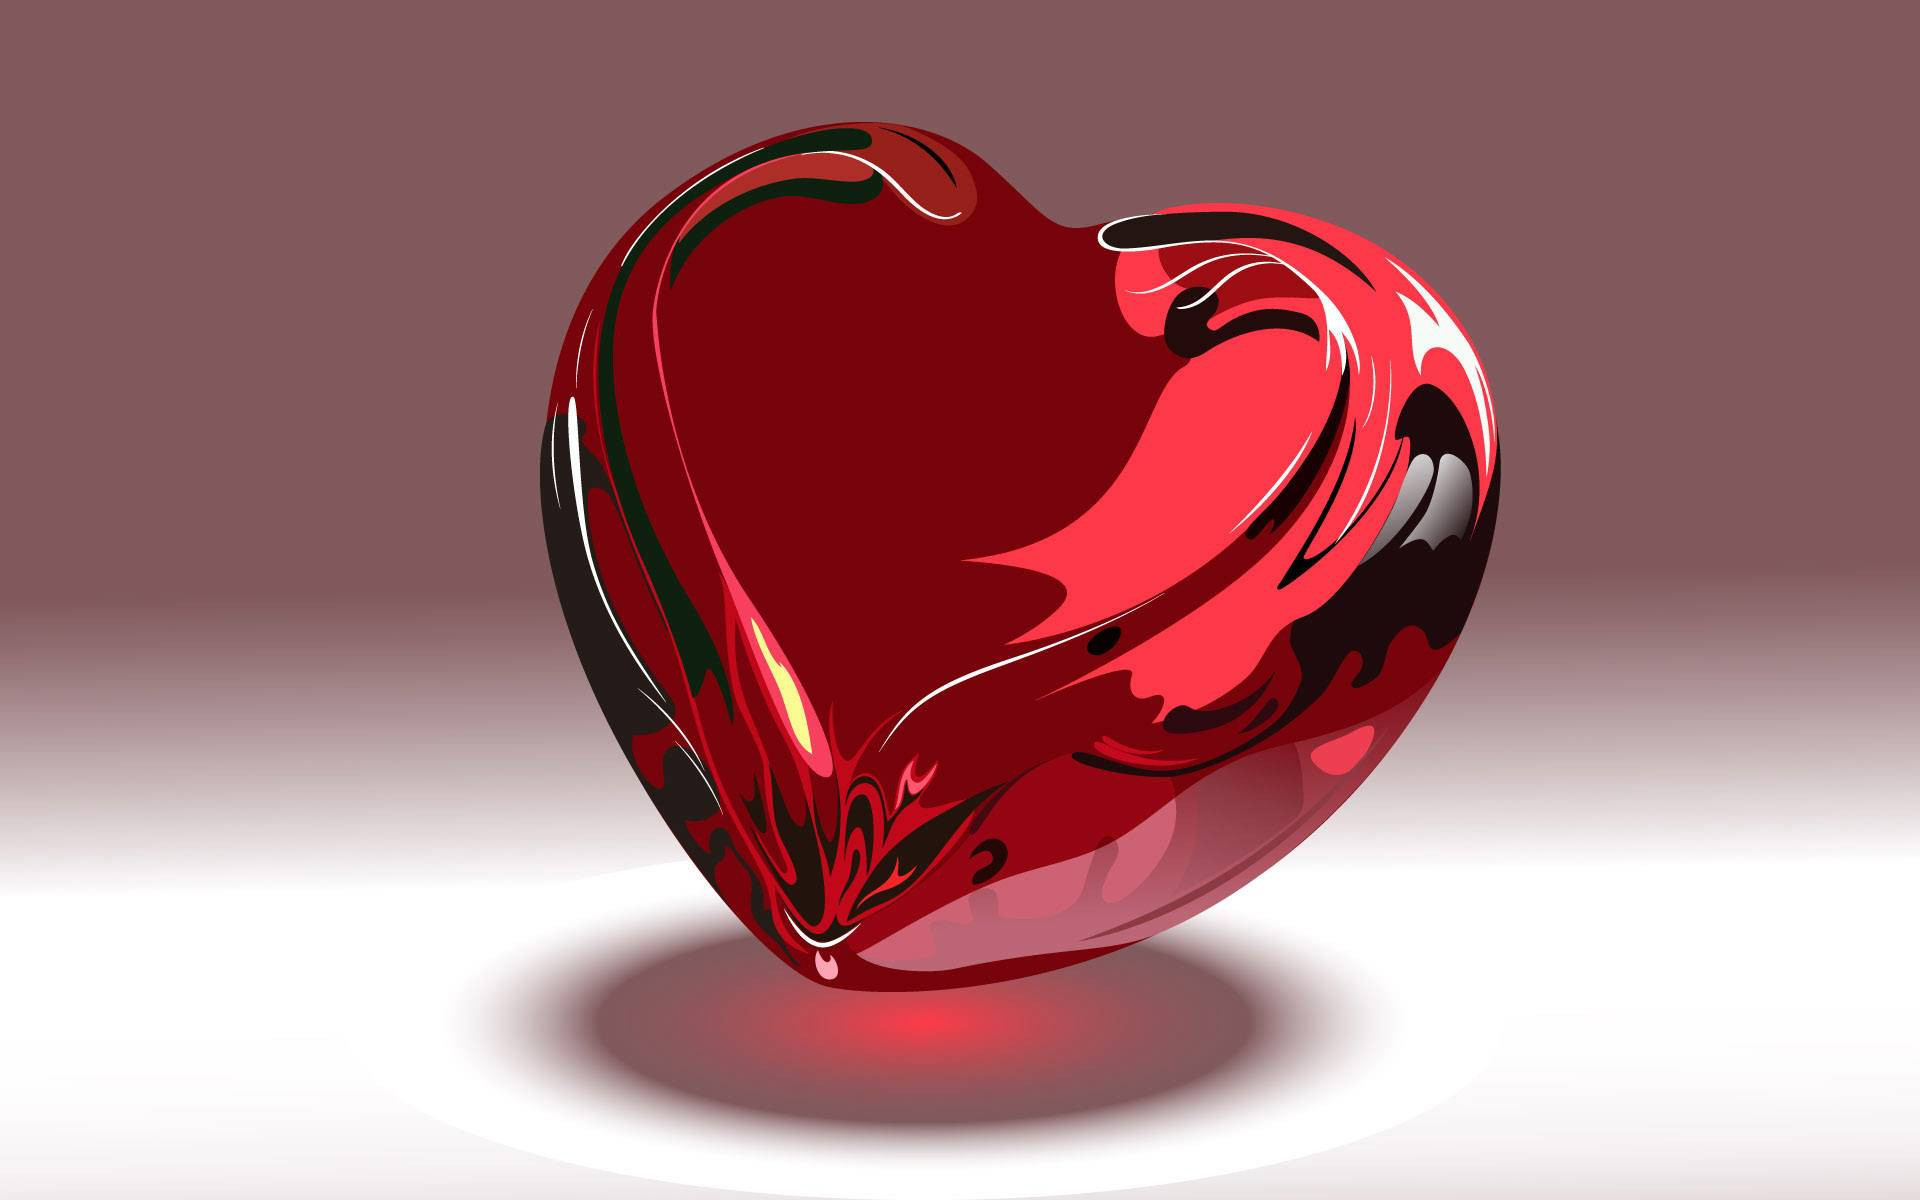 beautiful hearts wallpapers